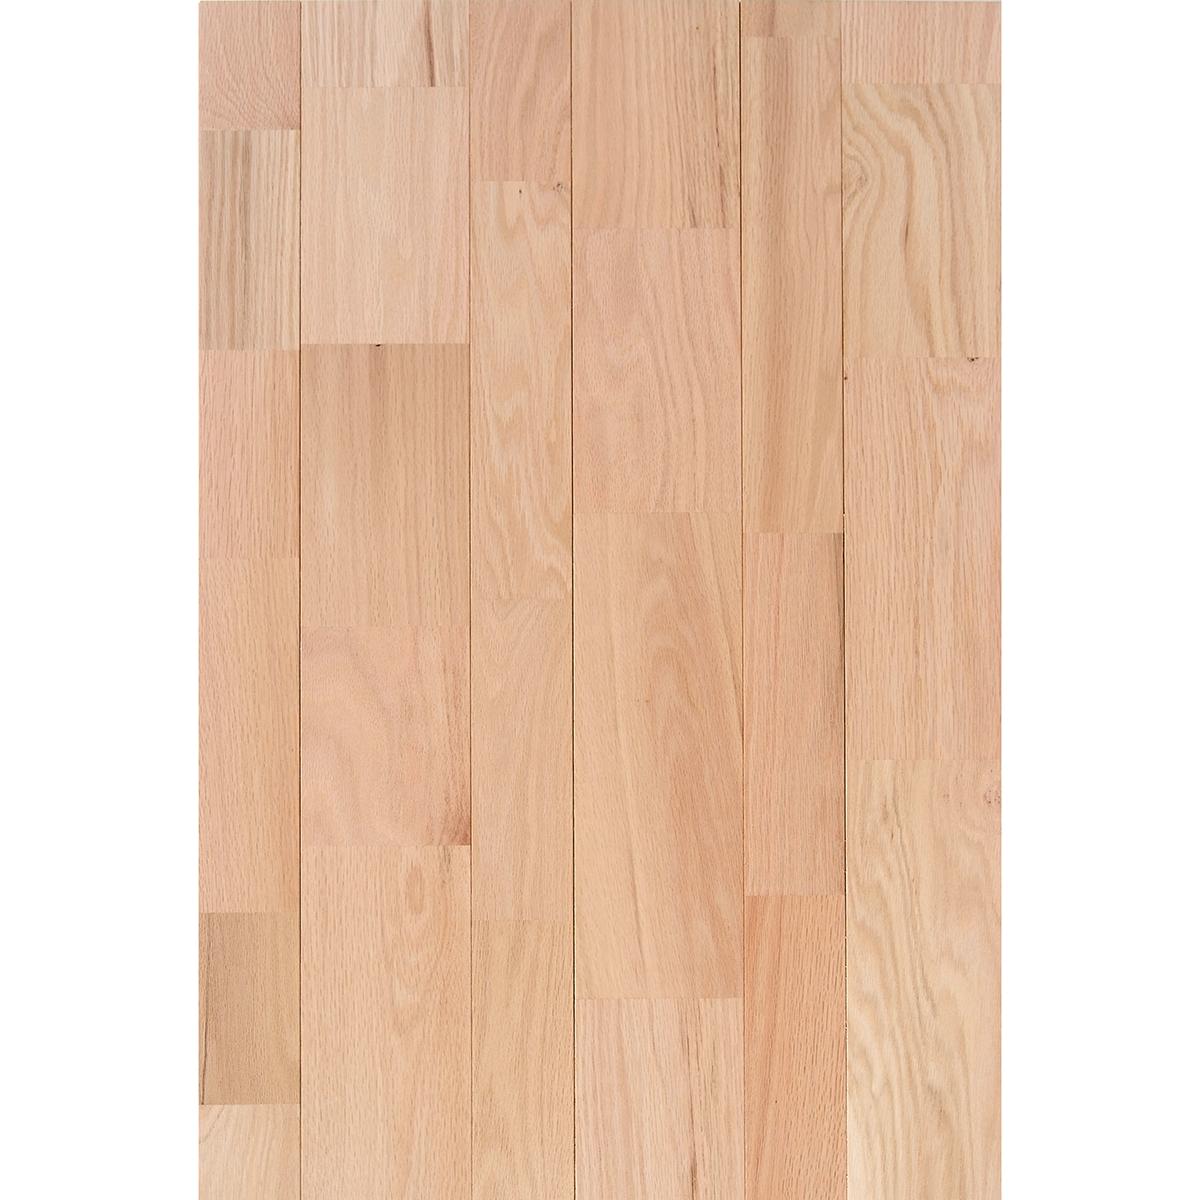 Finger Jointed Flooring : Red oak quot finger jointed flooring